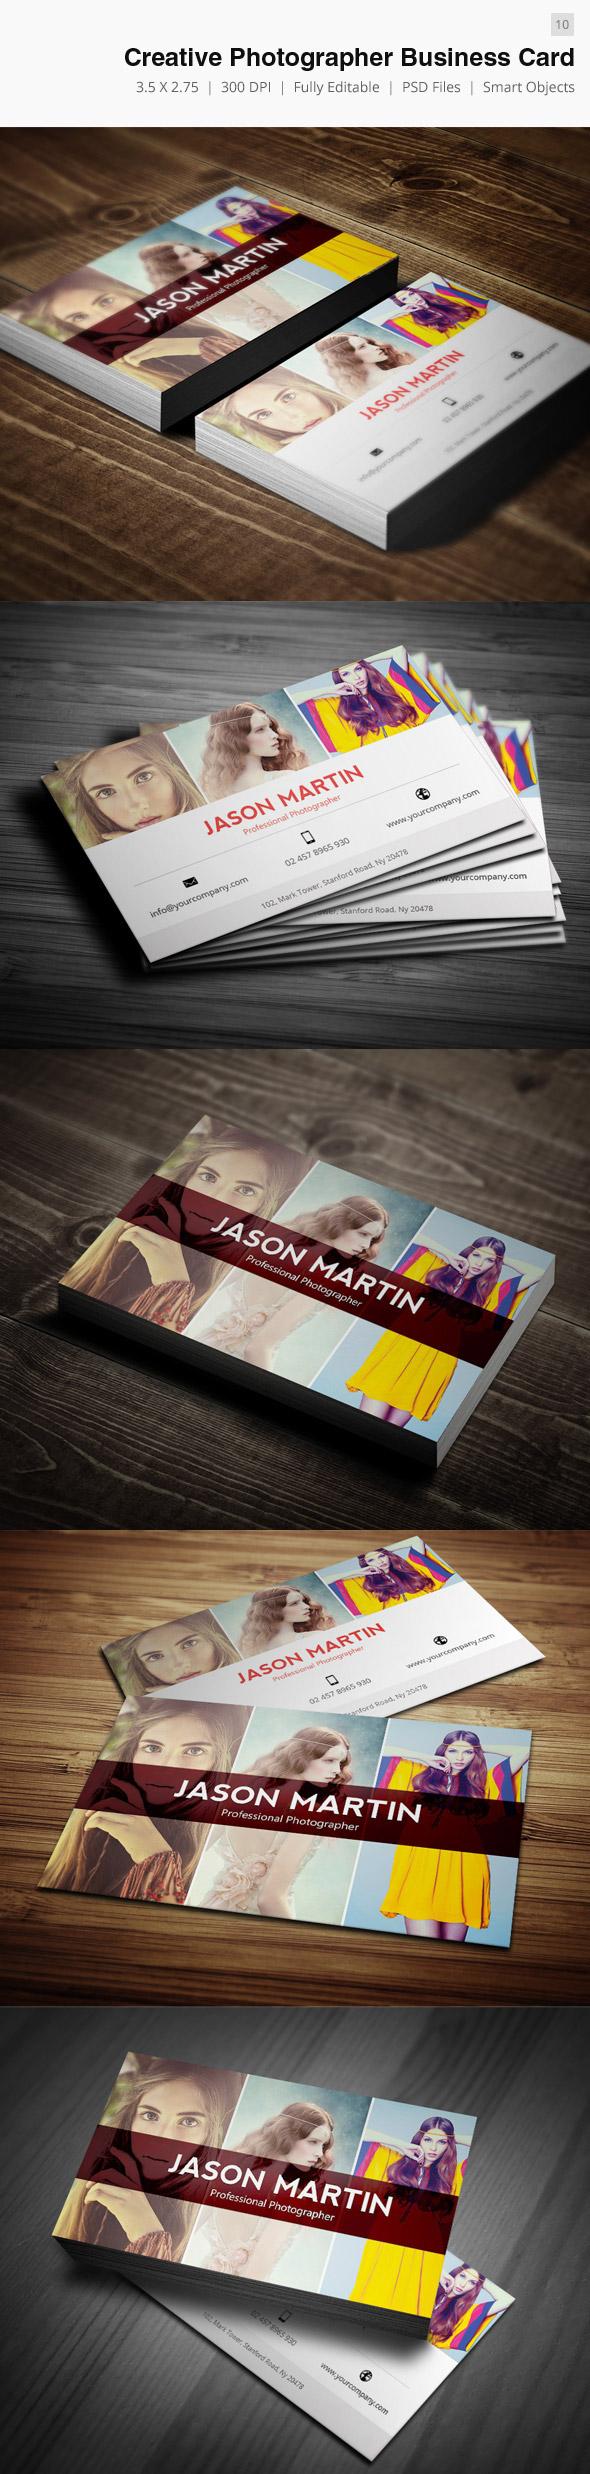 Creative Photographer Business Card on Behance